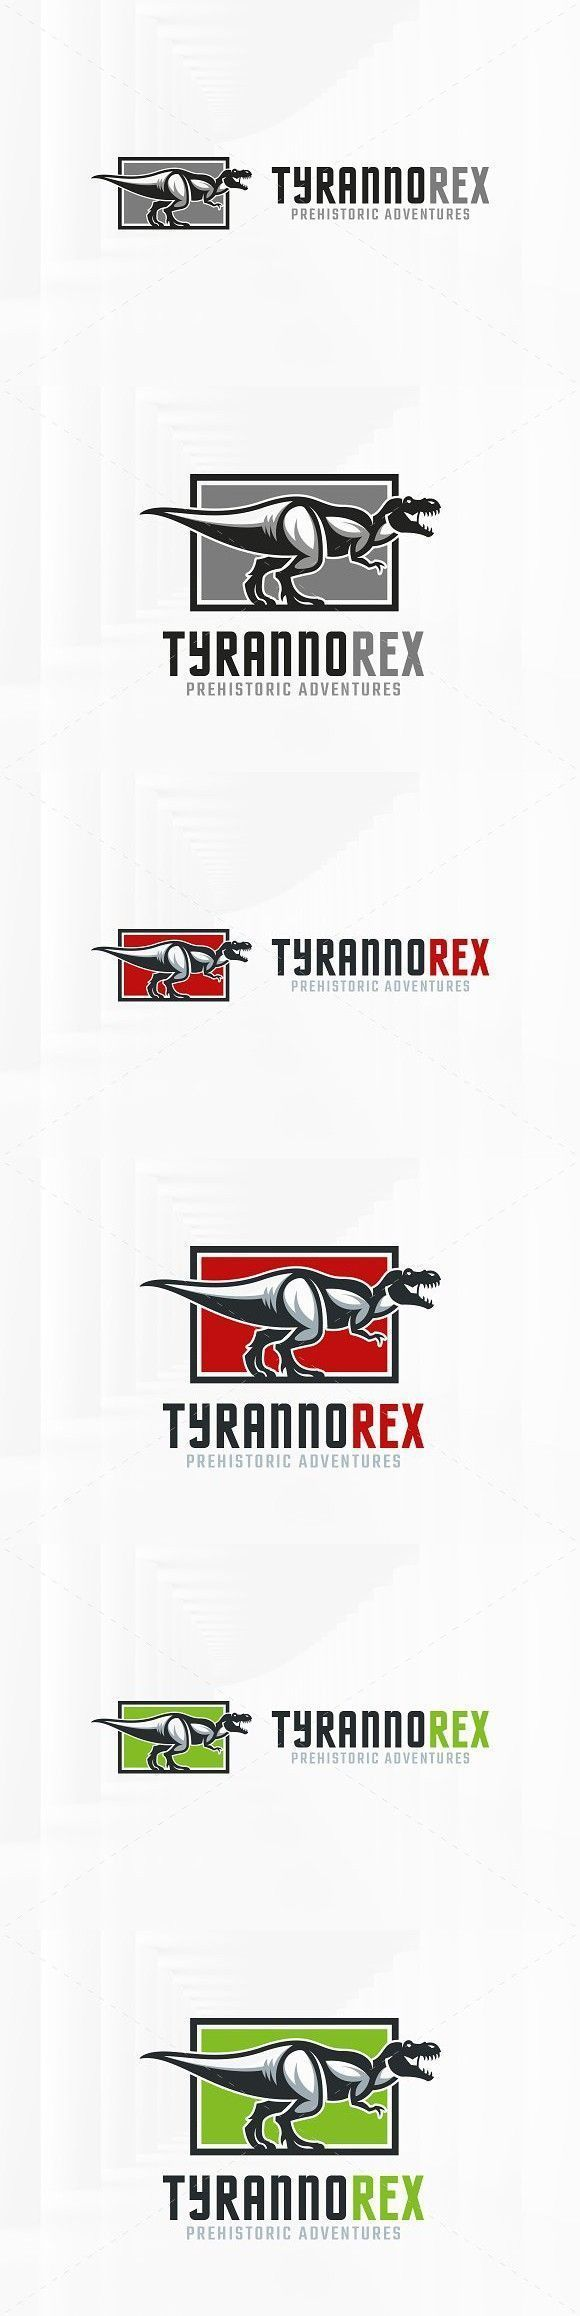 Tyrannosaurus Rex Logo Template #tyrannosaurusrex Tyrannosaurus Rex Logo Template #tyrannosaurusrex Tyrannosaurus Rex Logo Template #tyrannosaurusrex Tyrannosaurus Rex Logo Template #tyrannosaurusrex Tyrannosaurus Rex Logo Template #tyrannosaurusrex Tyrannosaurus Rex Logo Template #tyrannosaurusrex Tyrannosaurus Rex Logo Template #tyrannosaurusrex Tyrannosaurus Rex Logo Template #tyrannosaurusrex